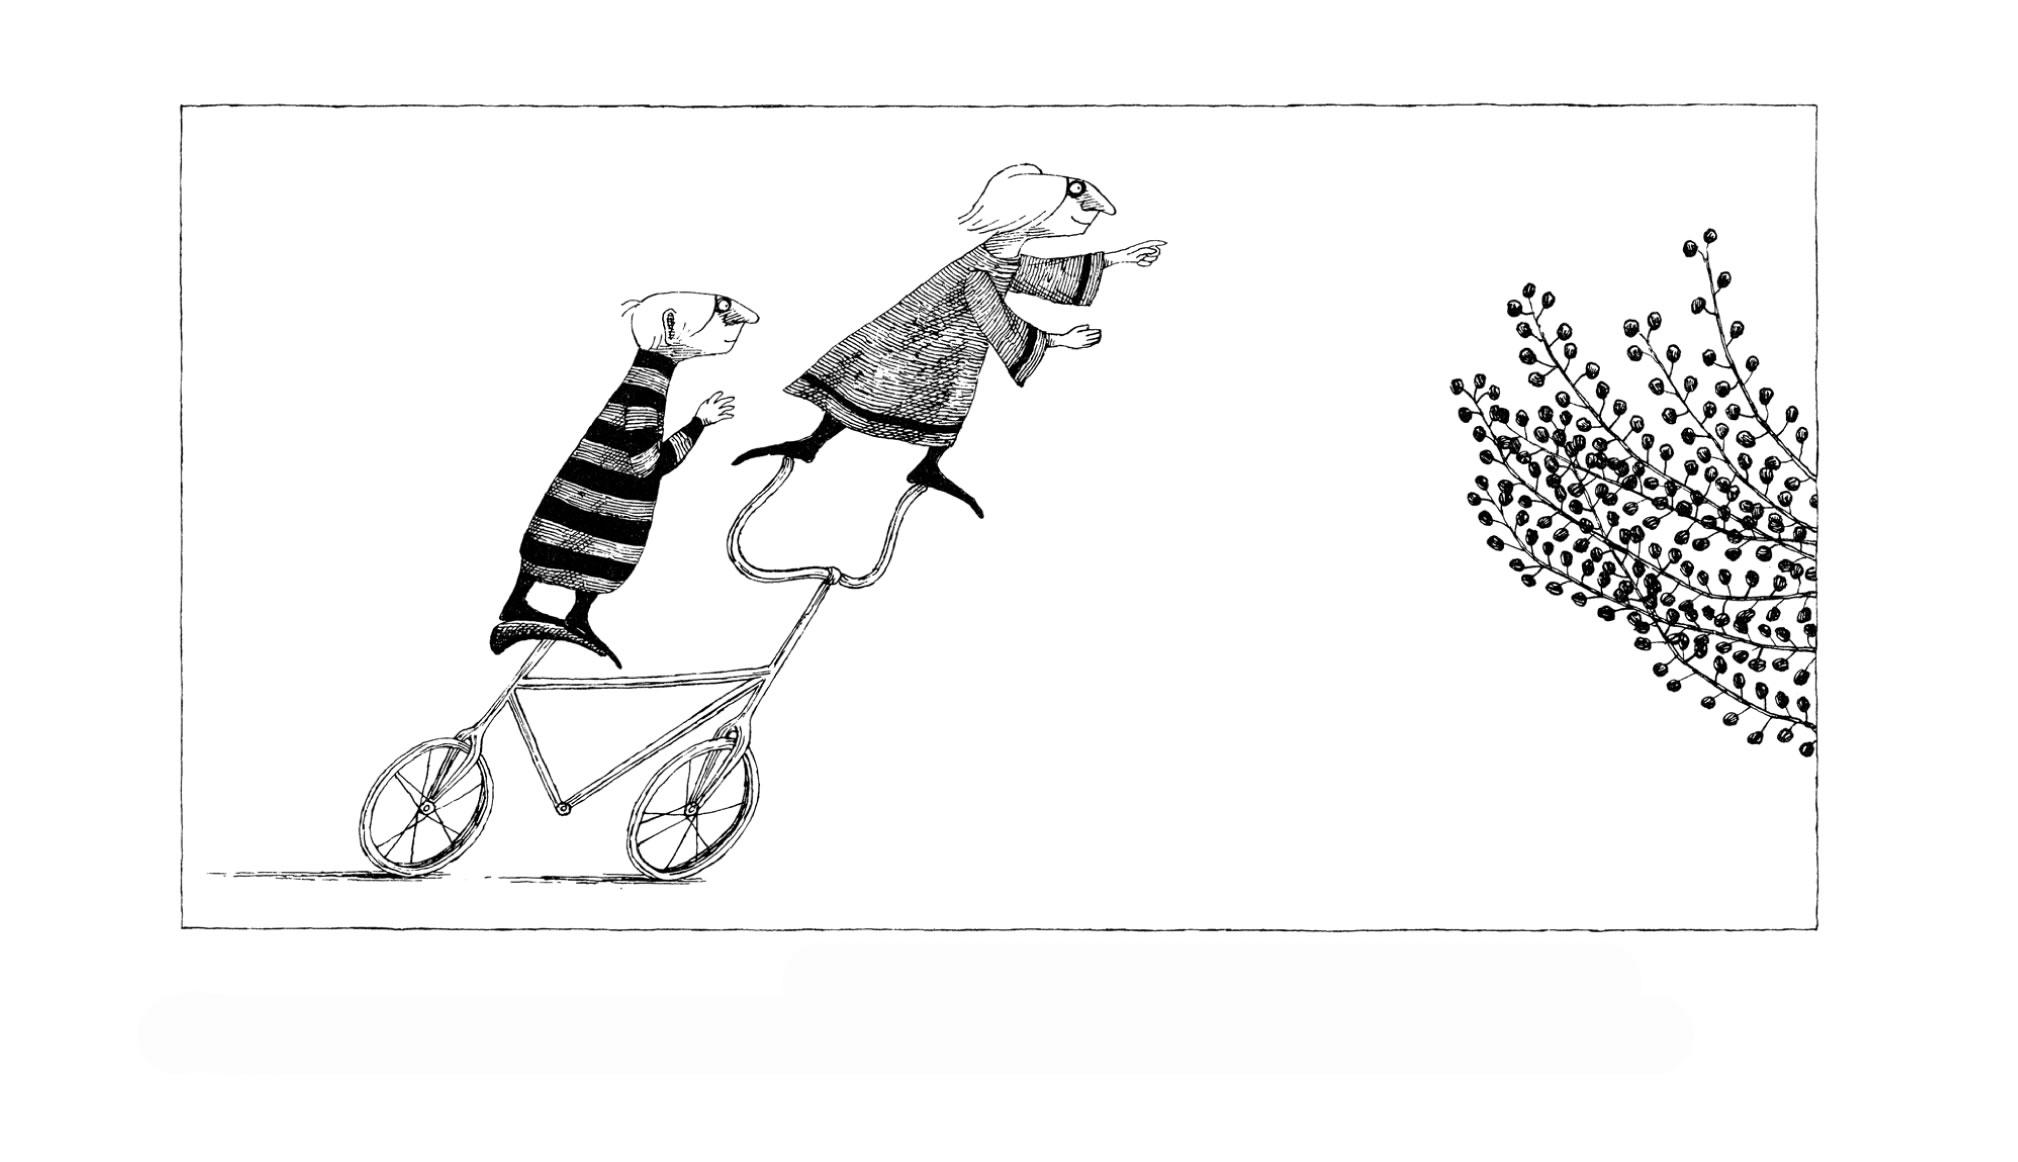 A Bicicleta Epipletica